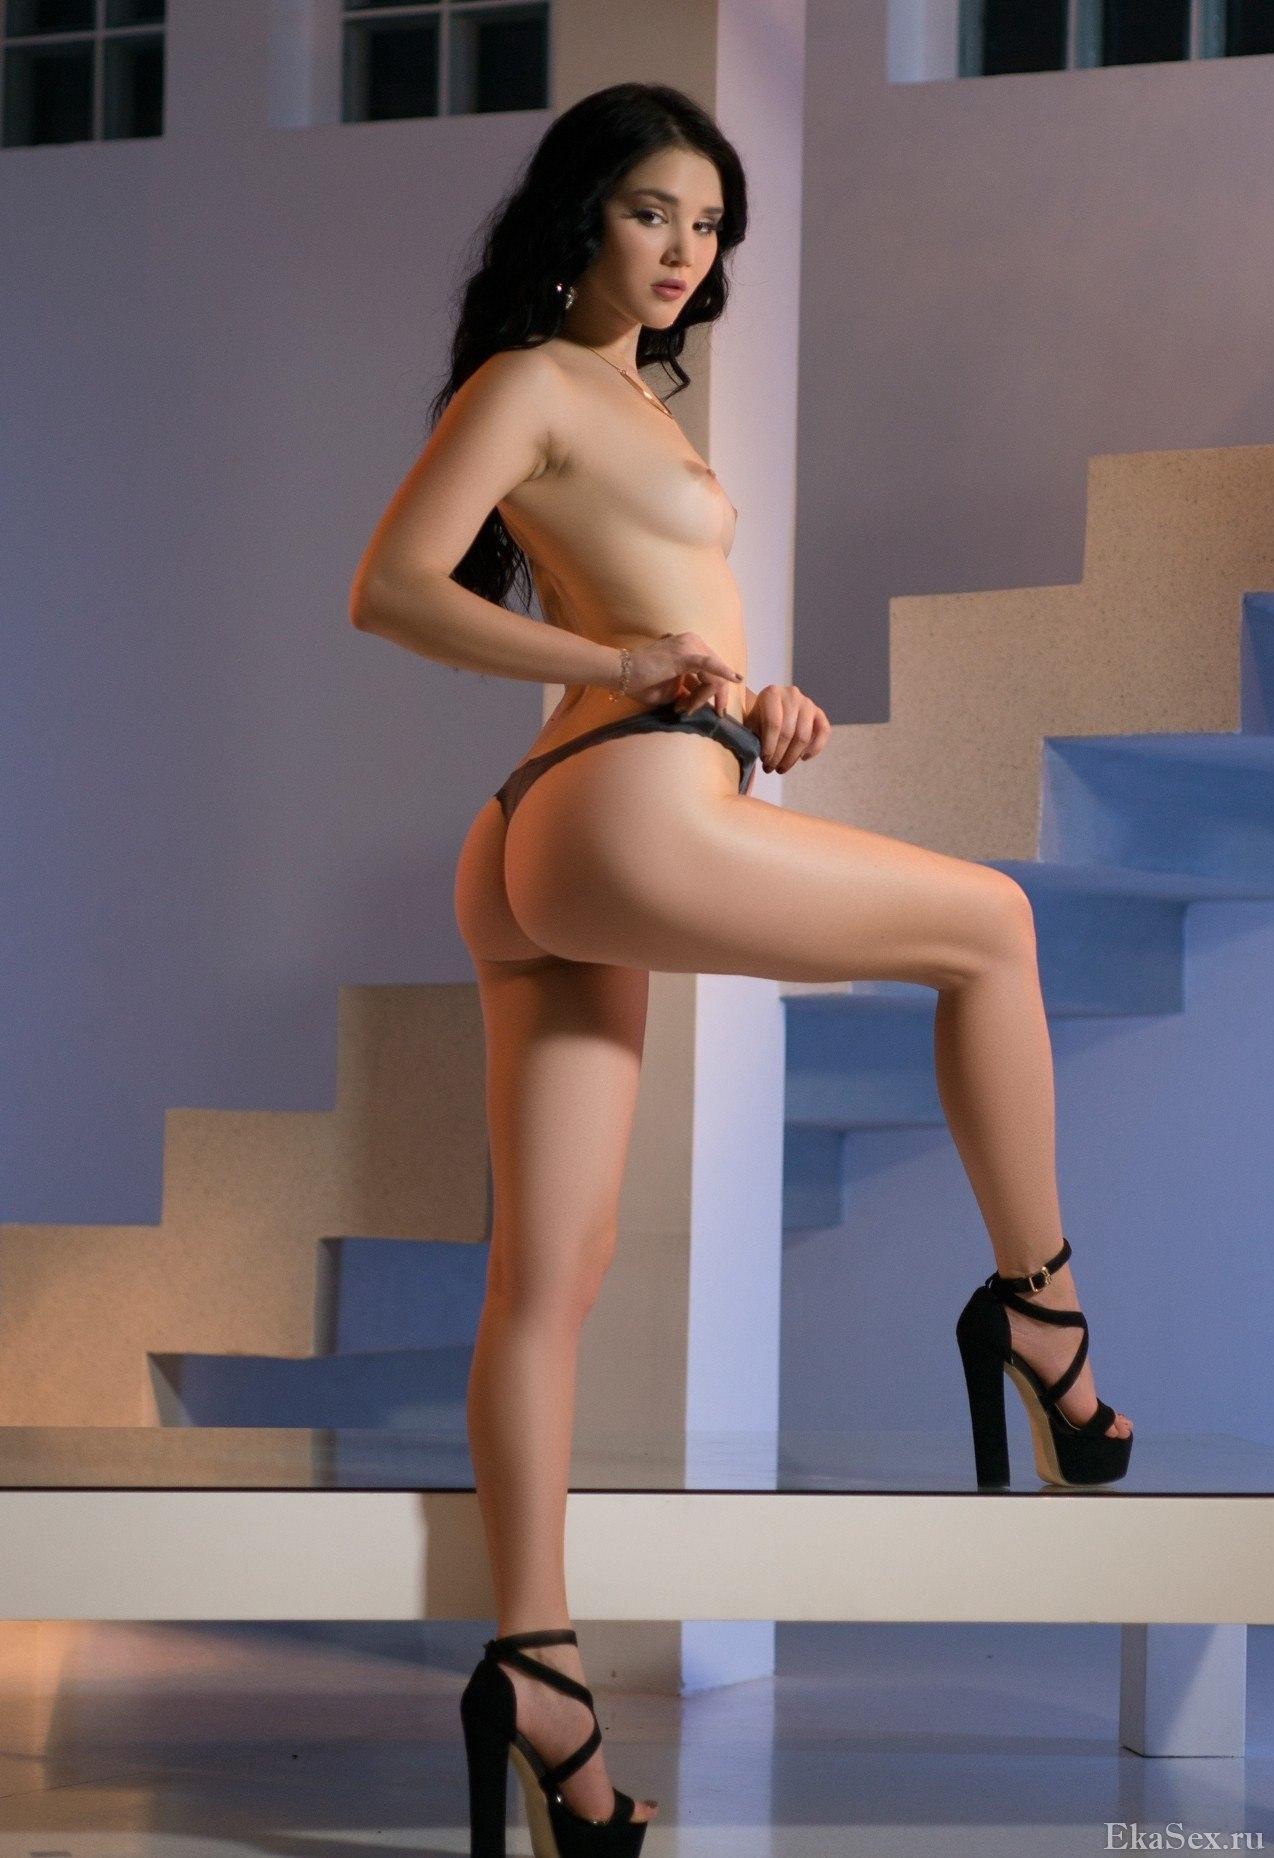 фото проститутки Дана из города Екатеринбург